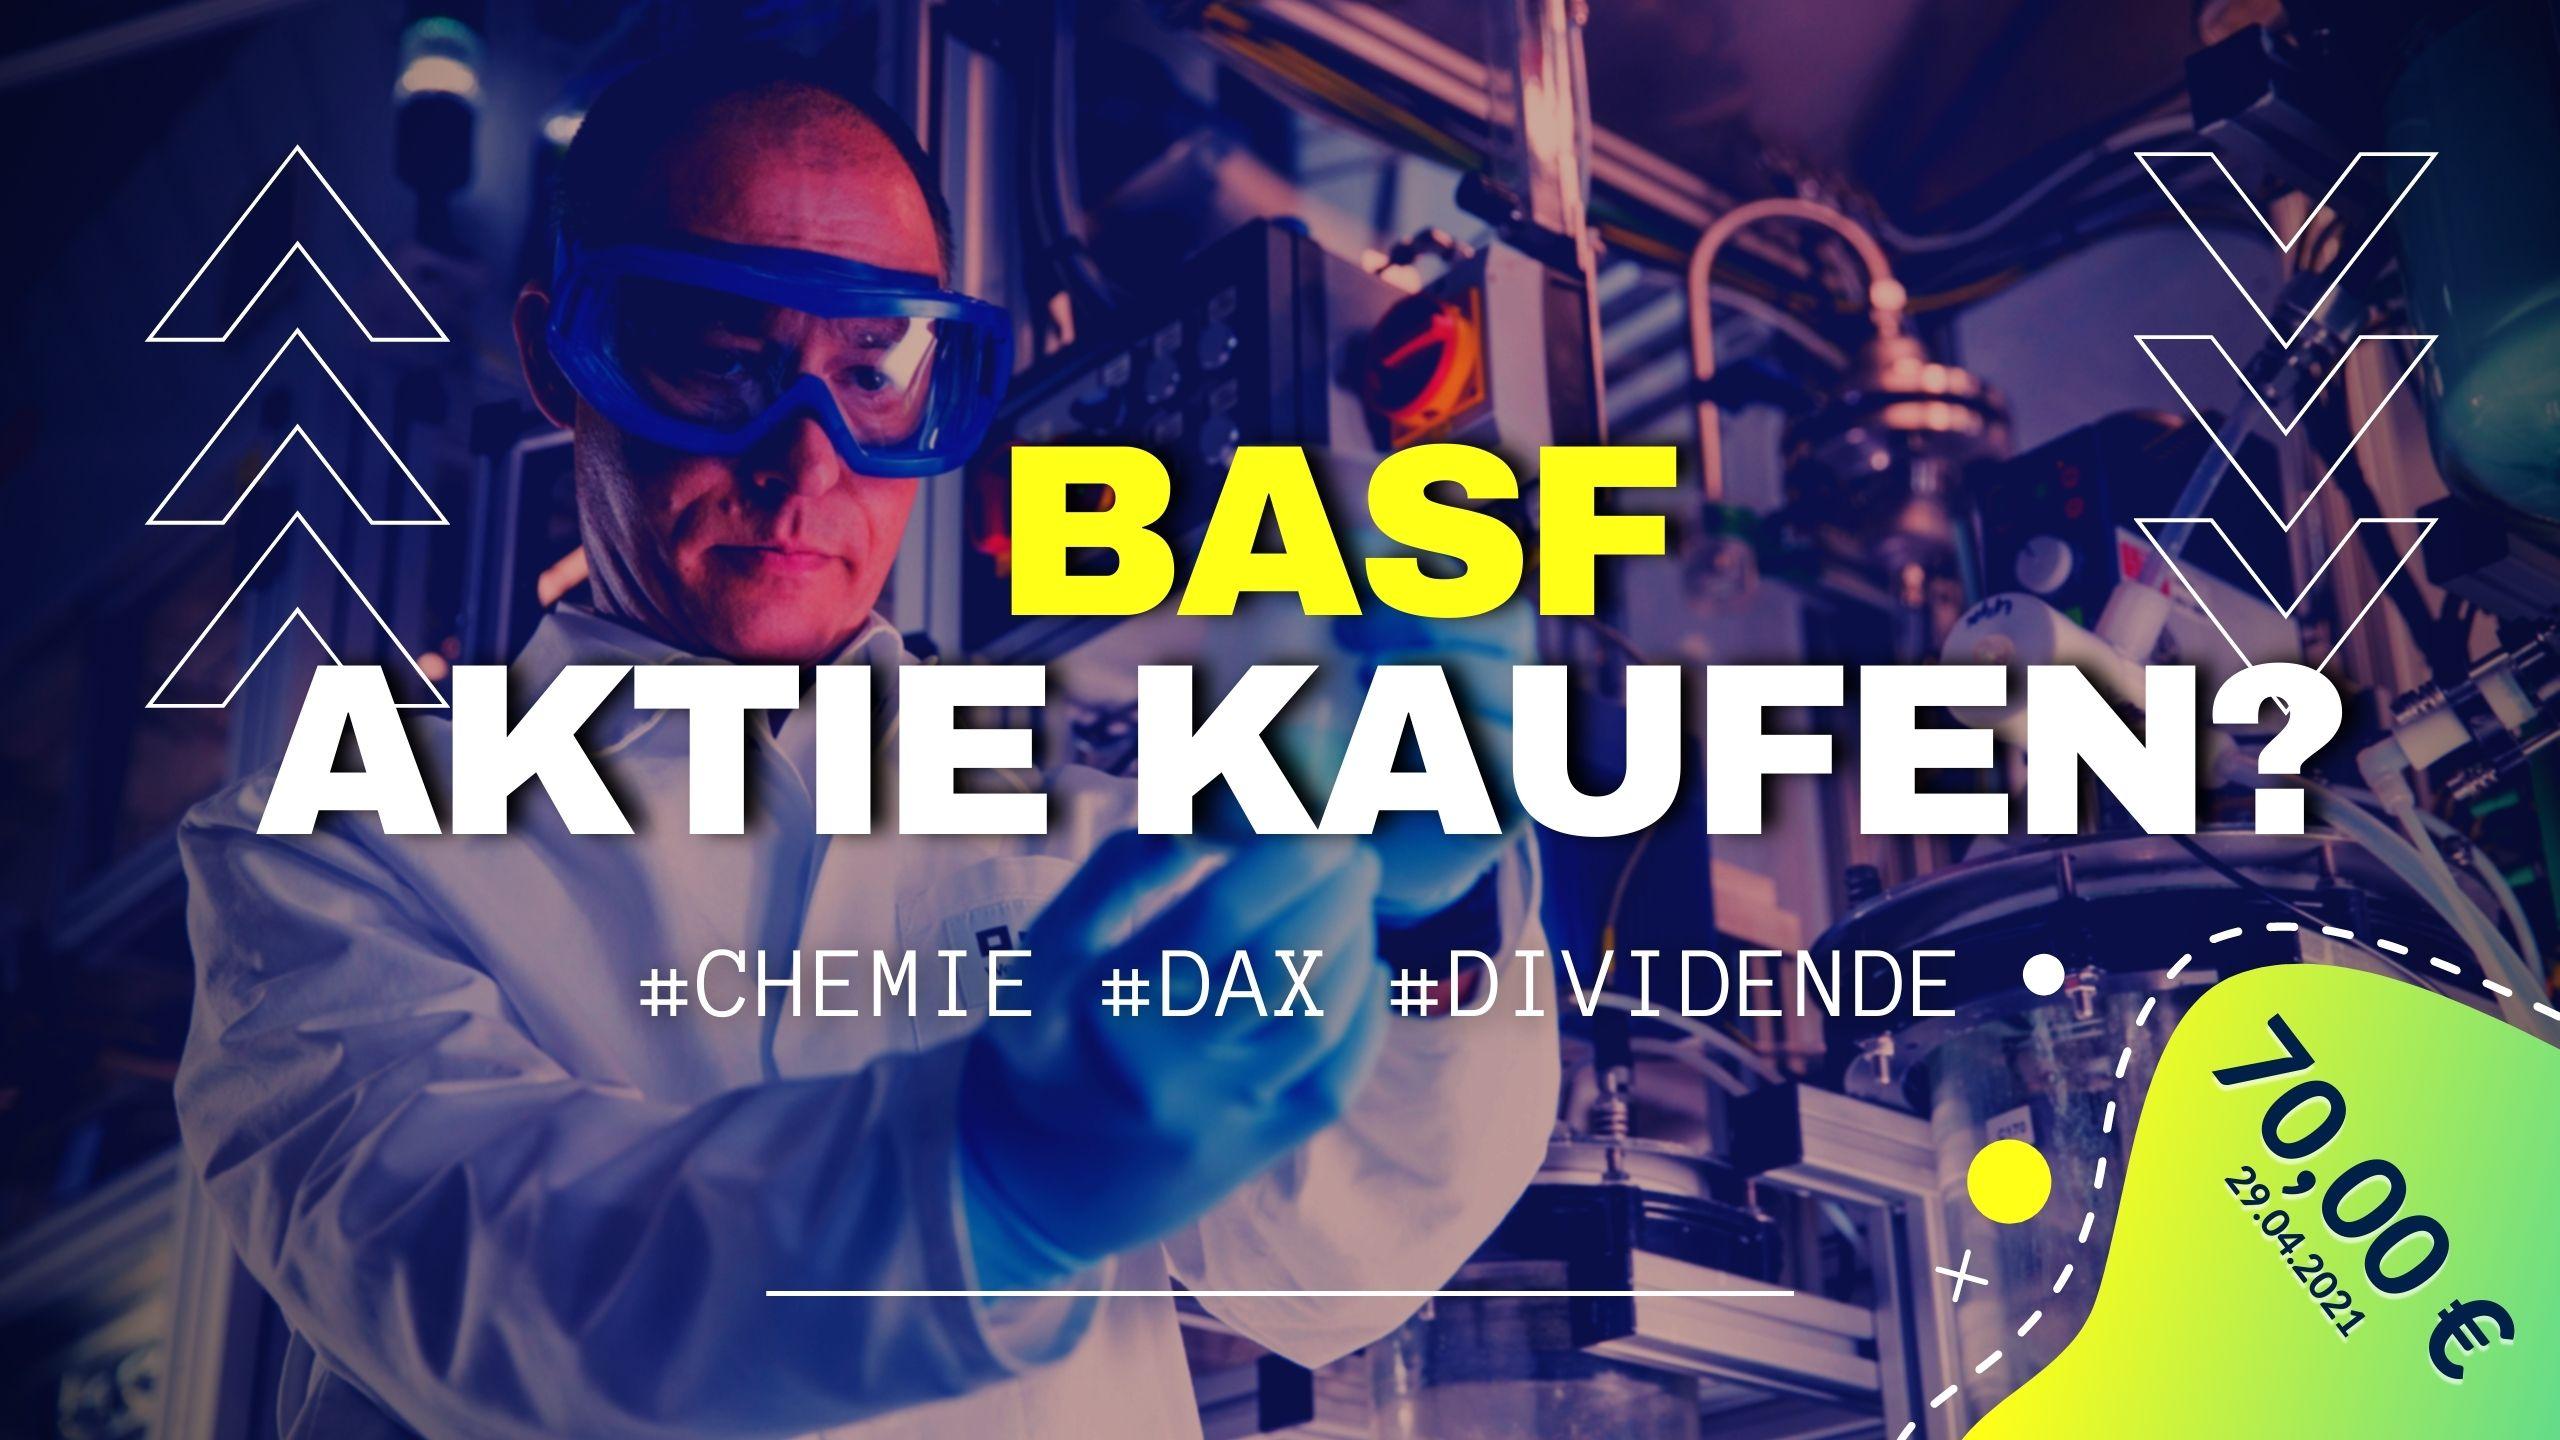 BASF Aktie kaufen